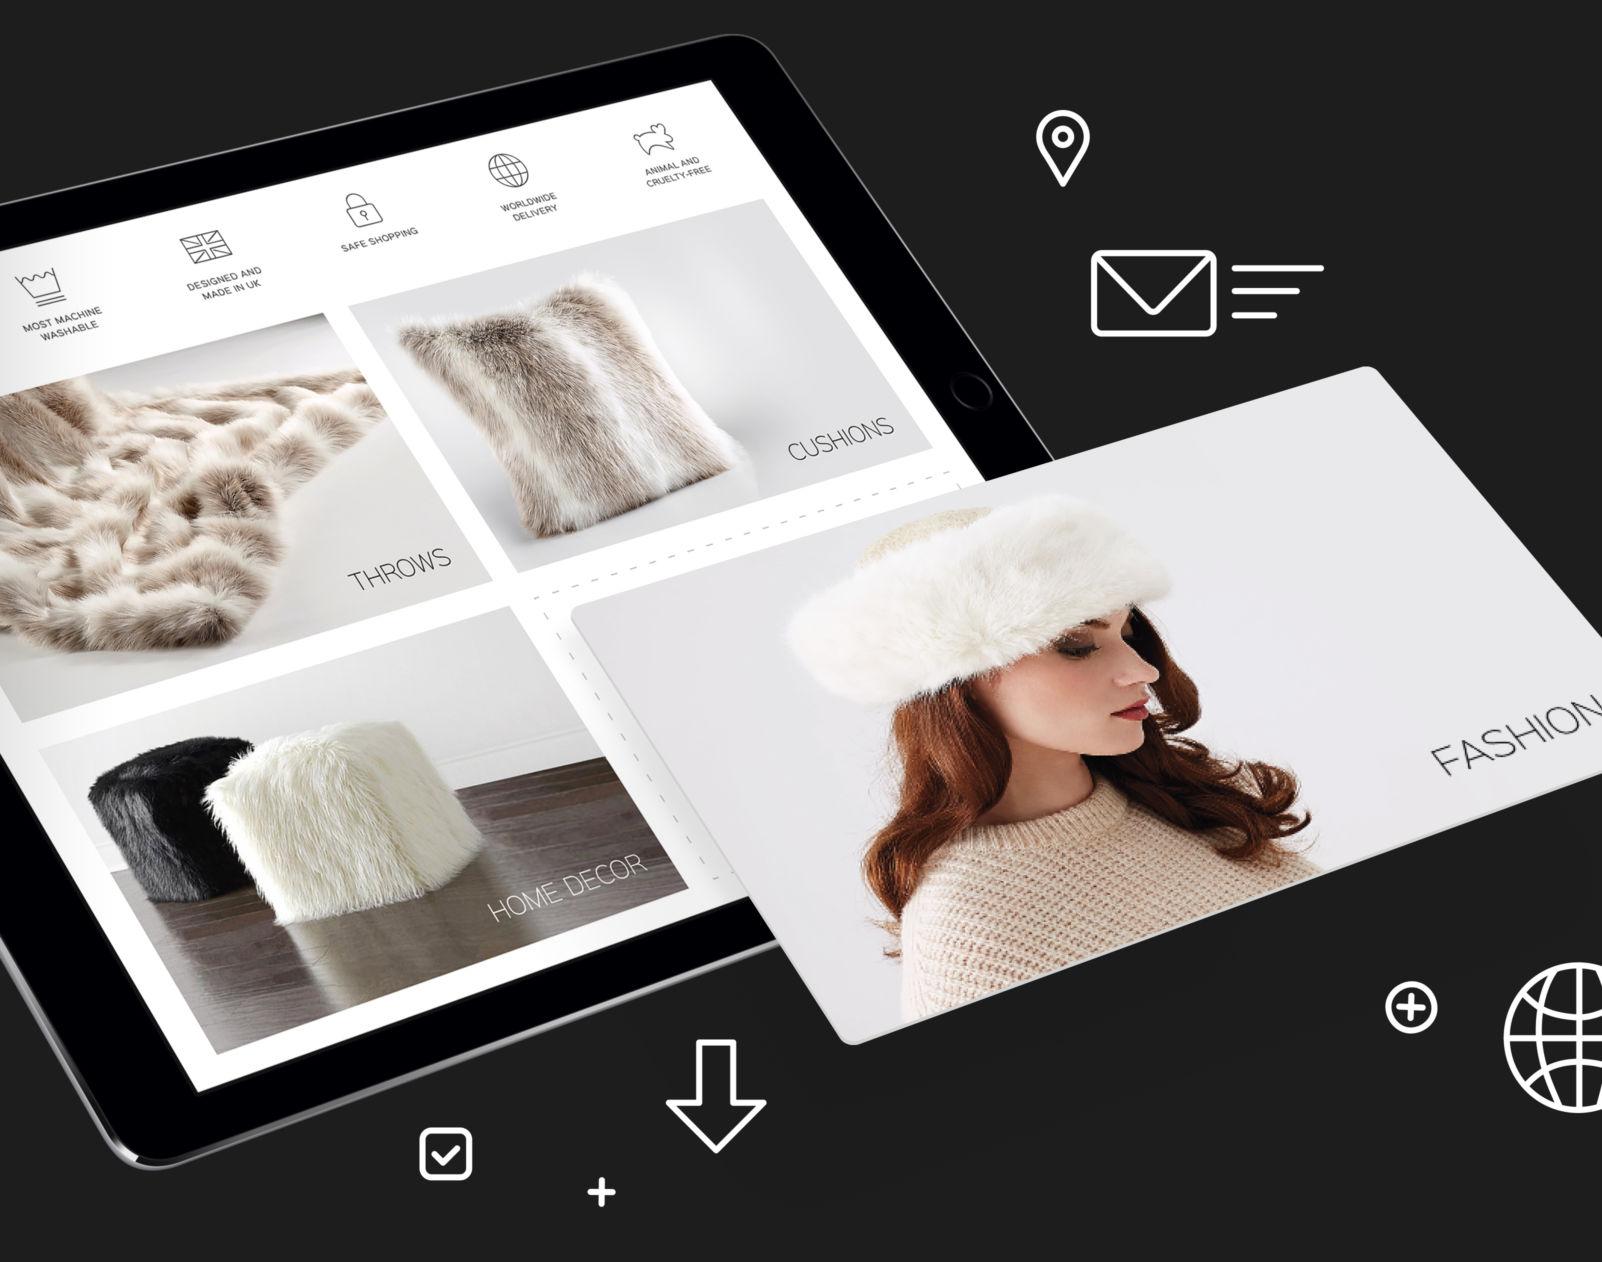 ecommerce web design company in qatar